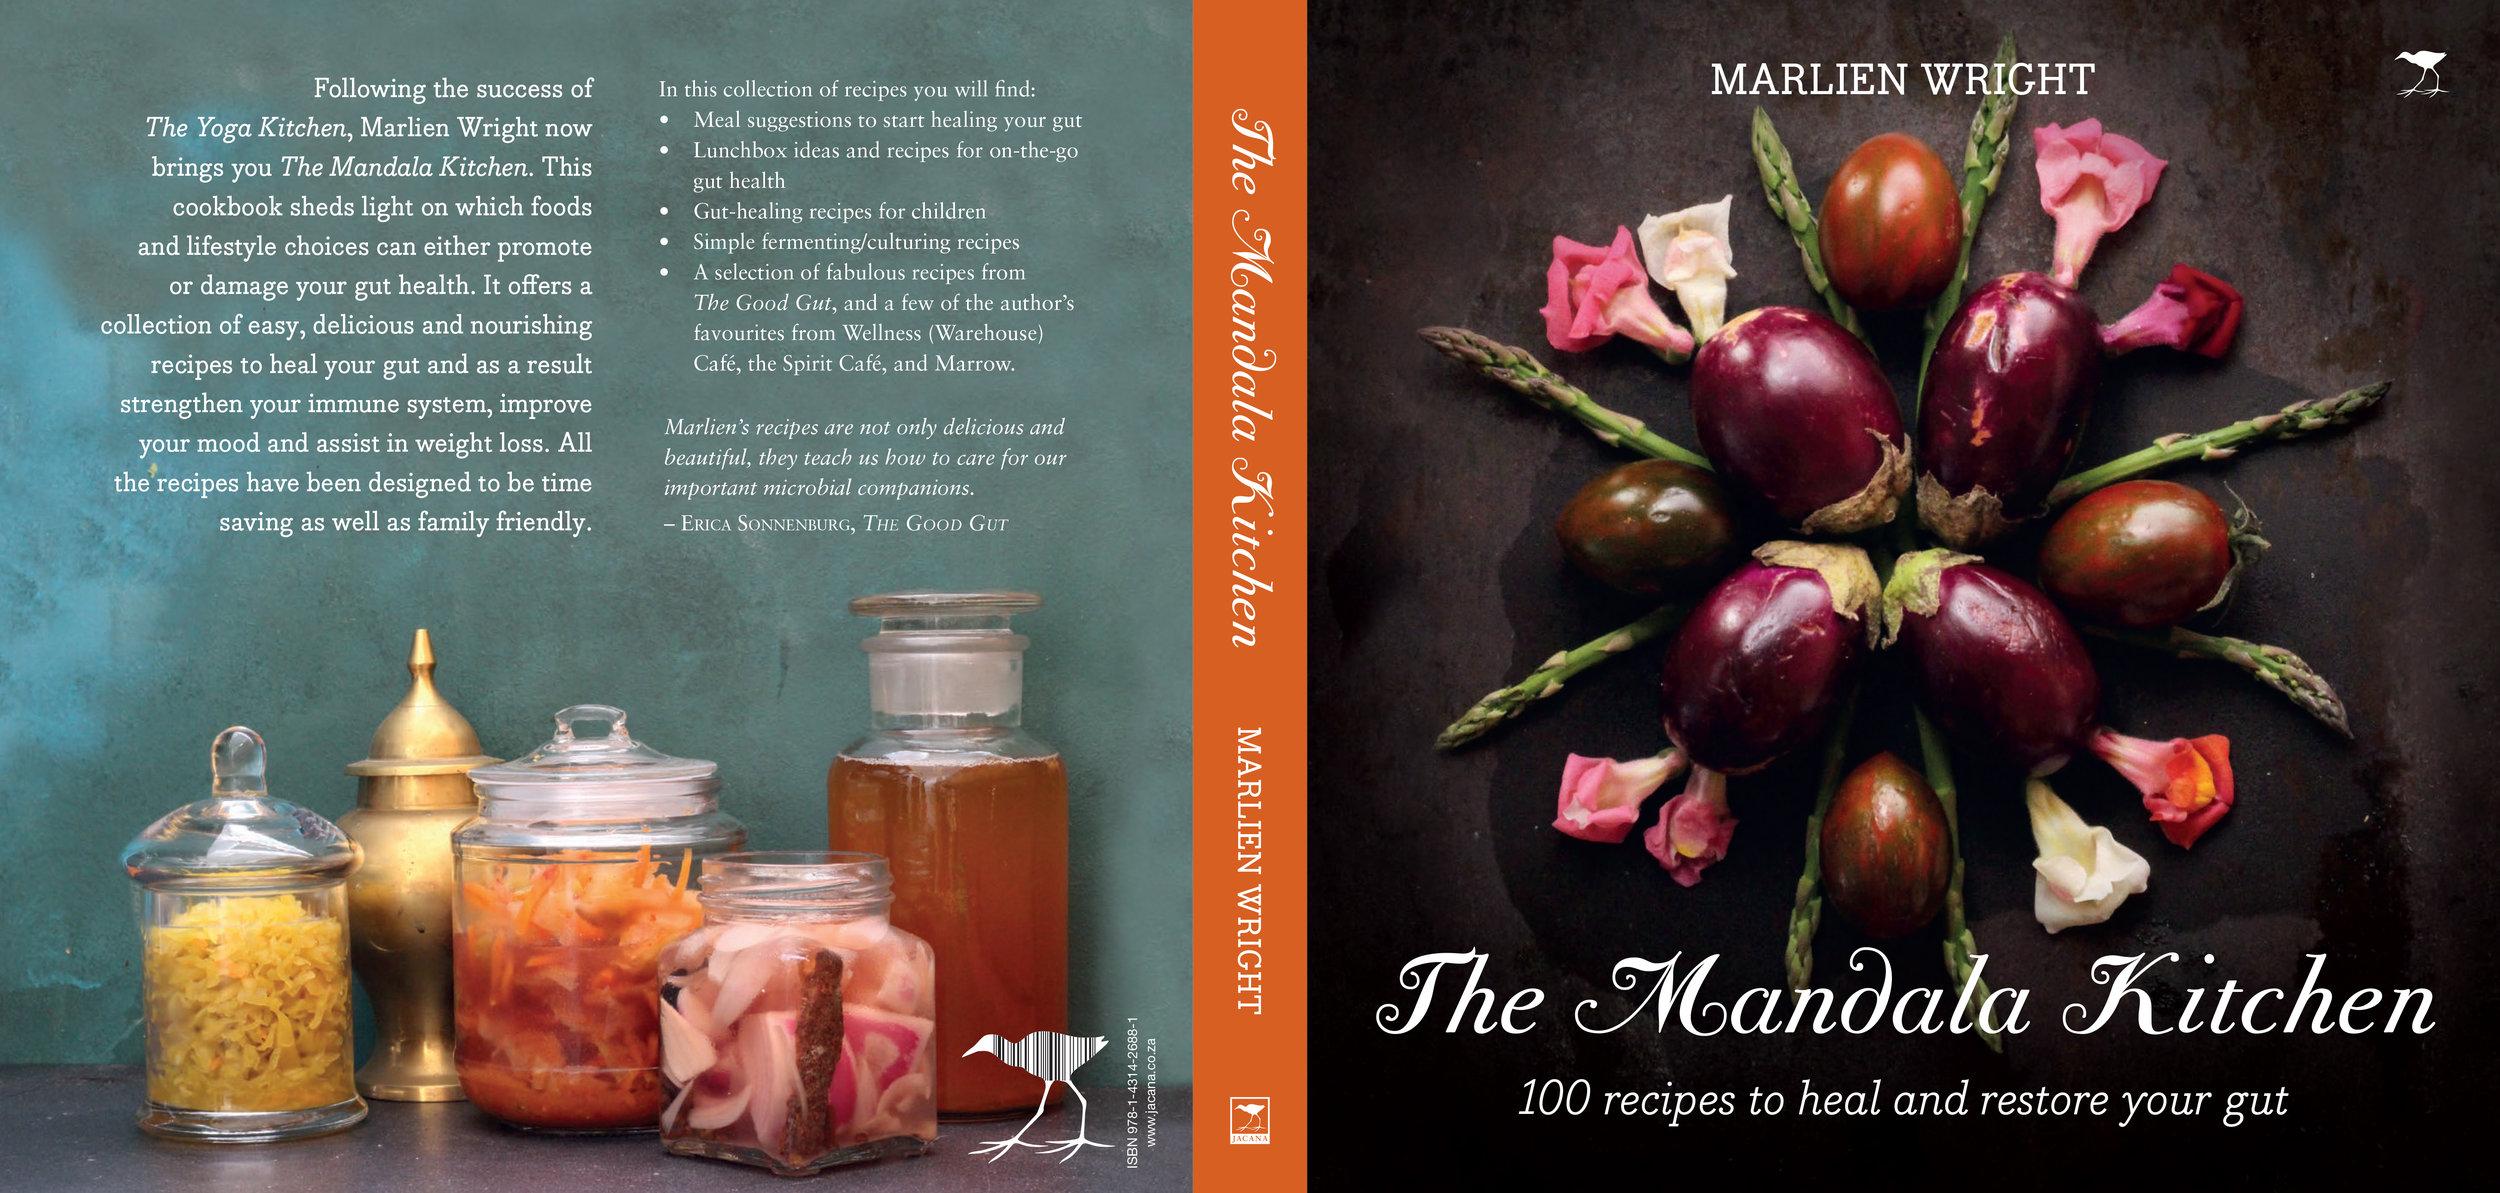 MANDALA KITCHEN COVER_new.jpg